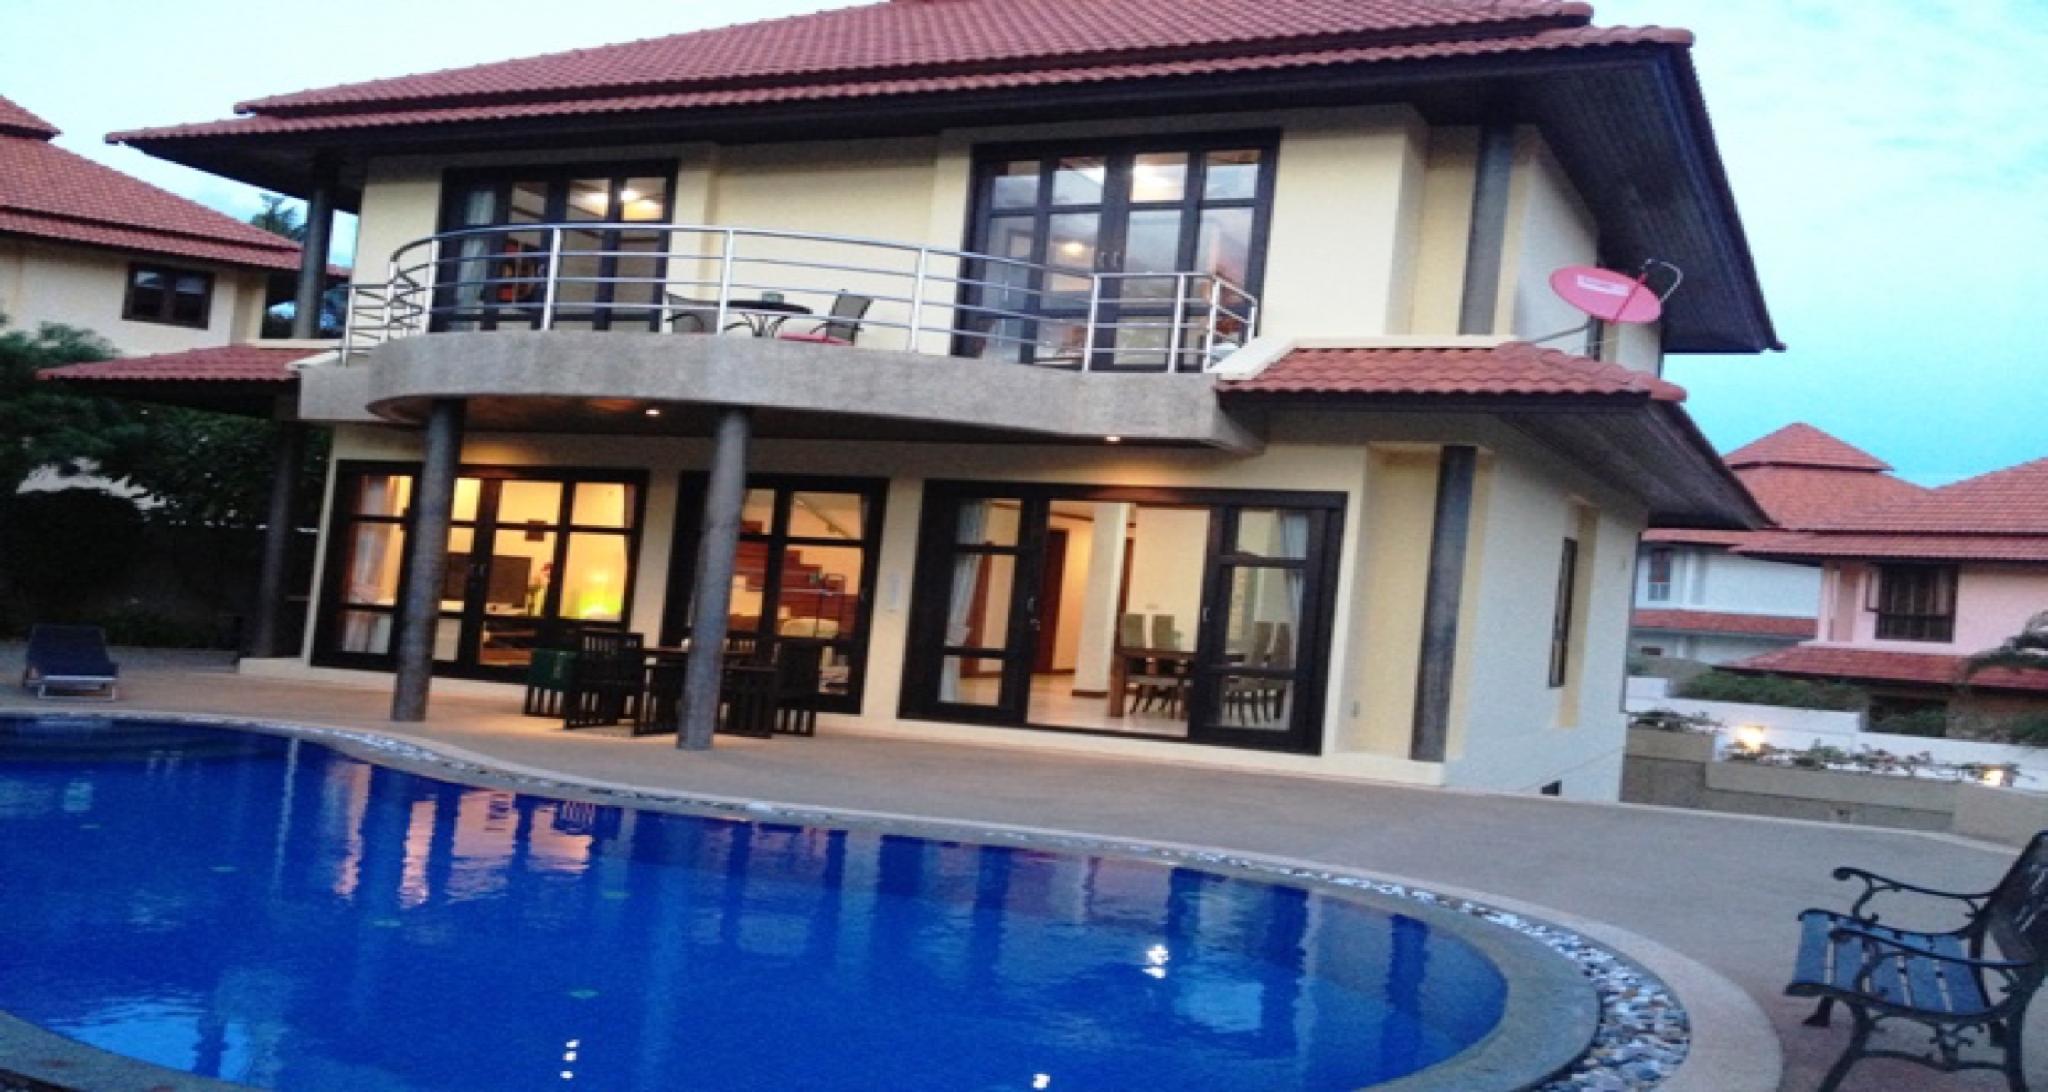 4 Bedroom Villa on beachfront resort (TG44) 4 Bedroom Villa on beachfront resort (TG44)